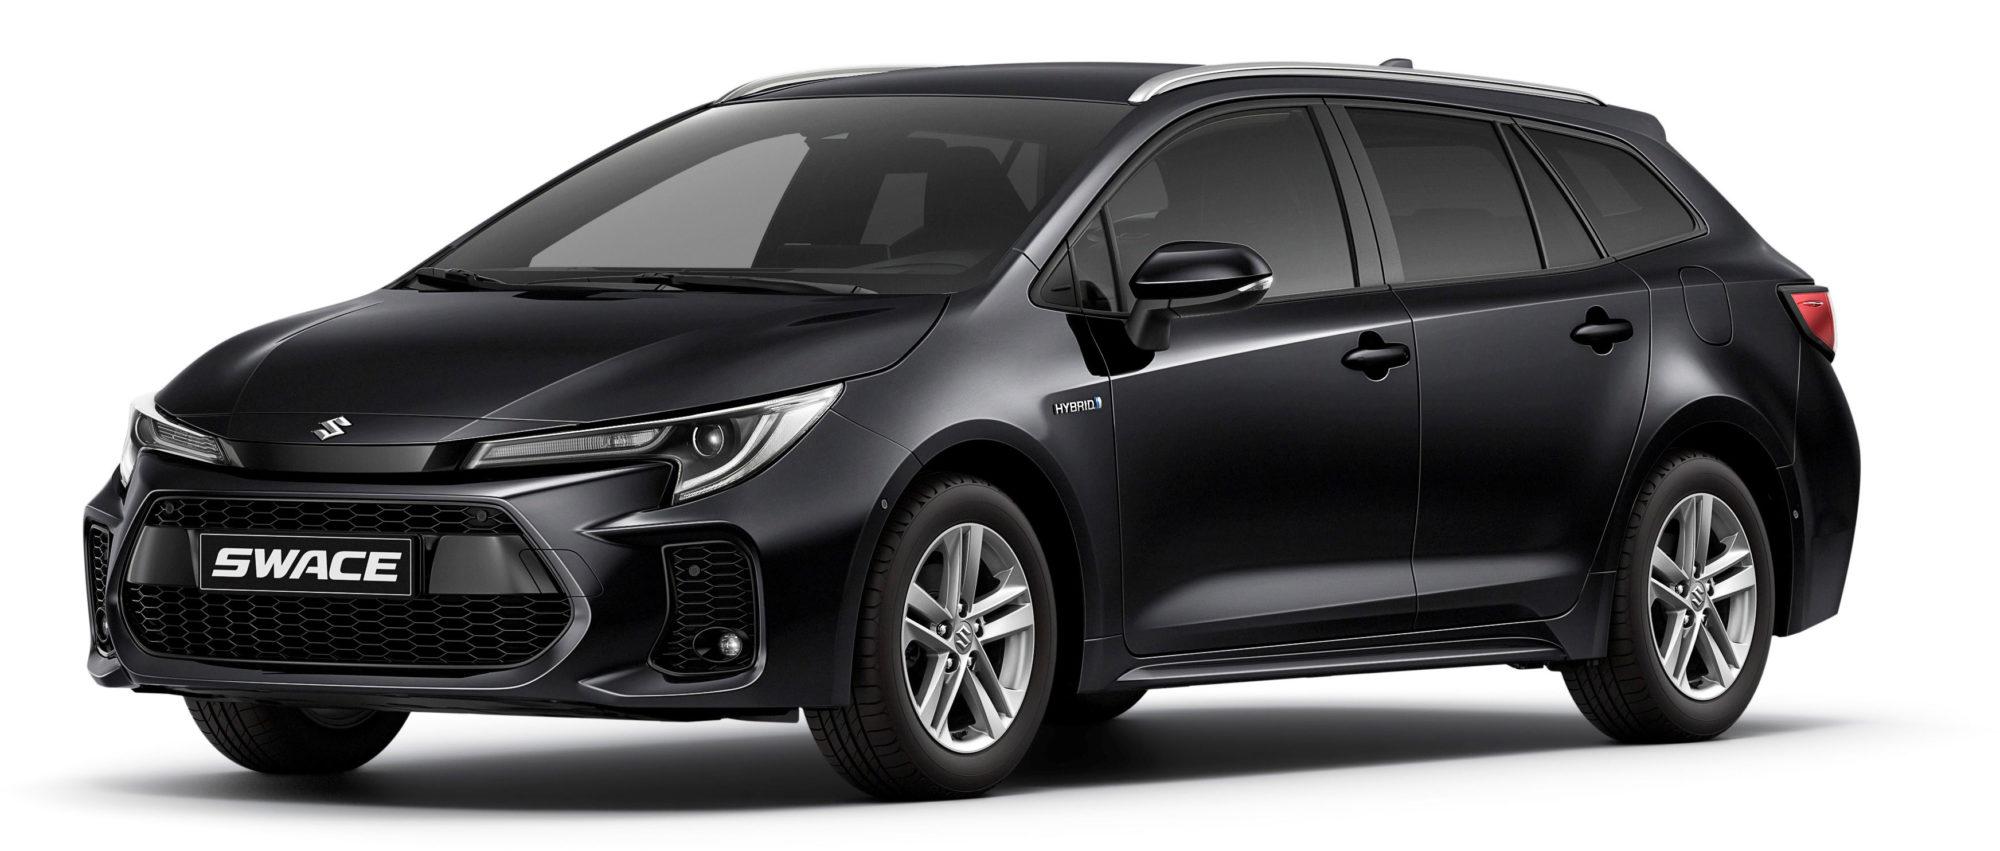 Suzuki Swace 2020 -